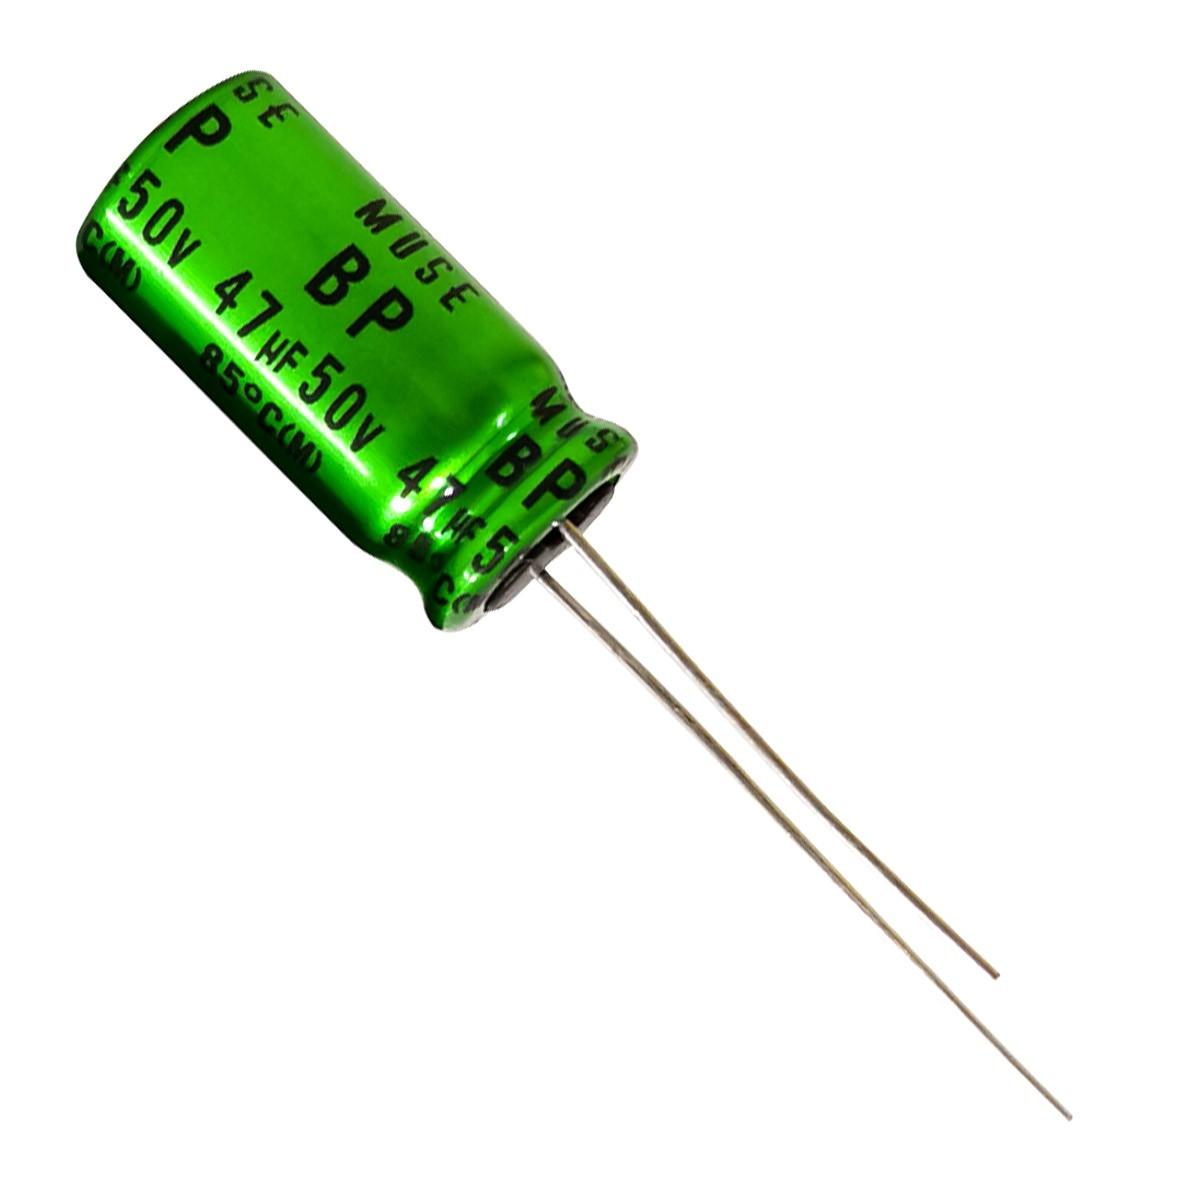 NICHICON ES MUSE Condensateur Audio Audiophile 35V 33µF